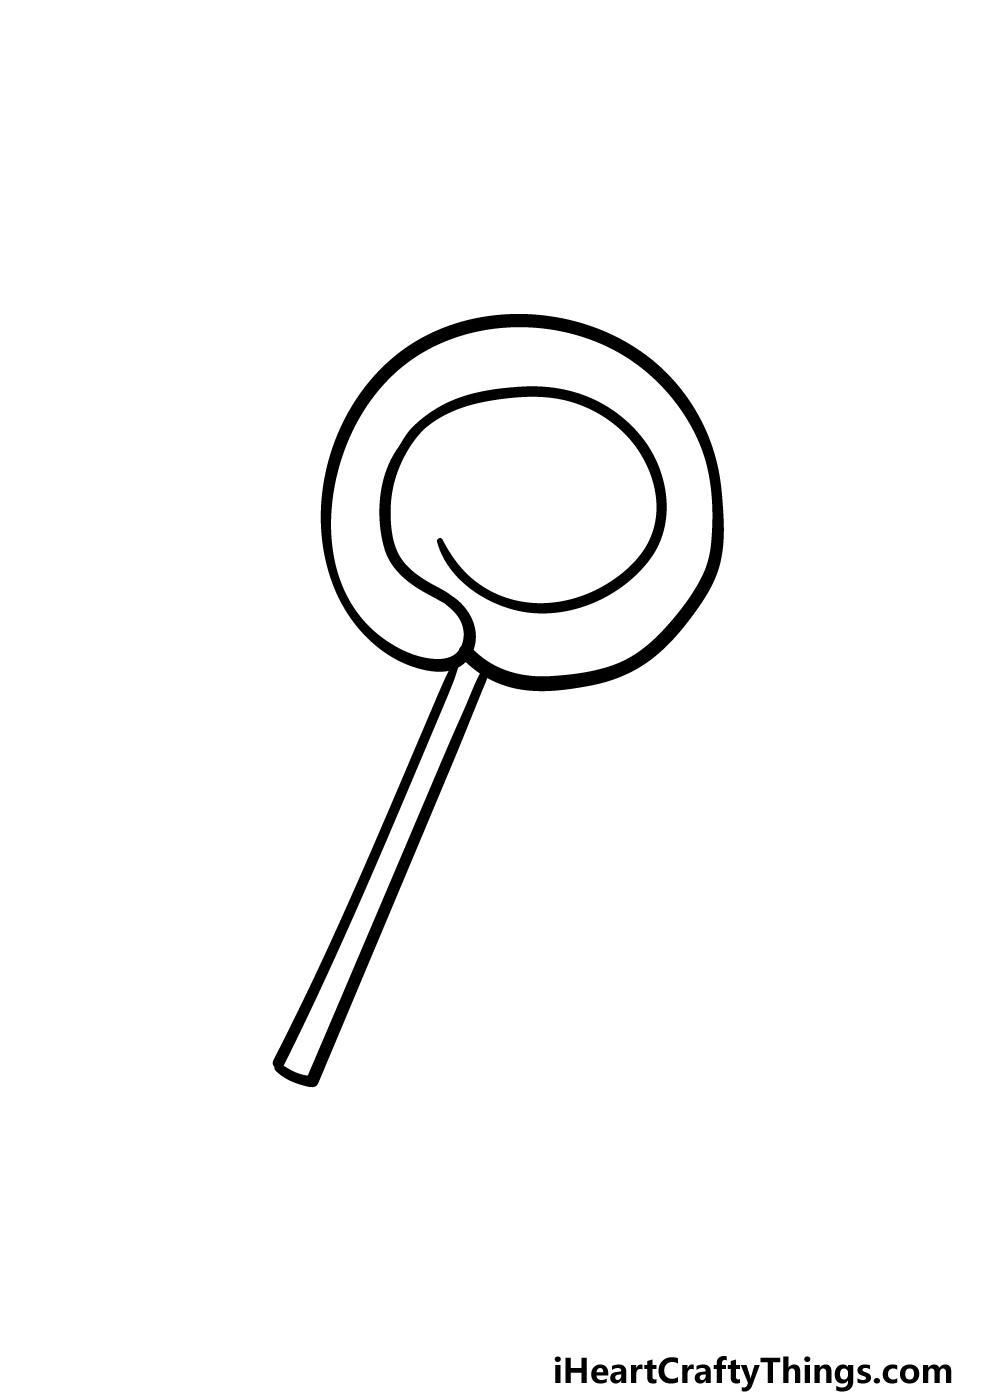 drawing a lollipop step 3